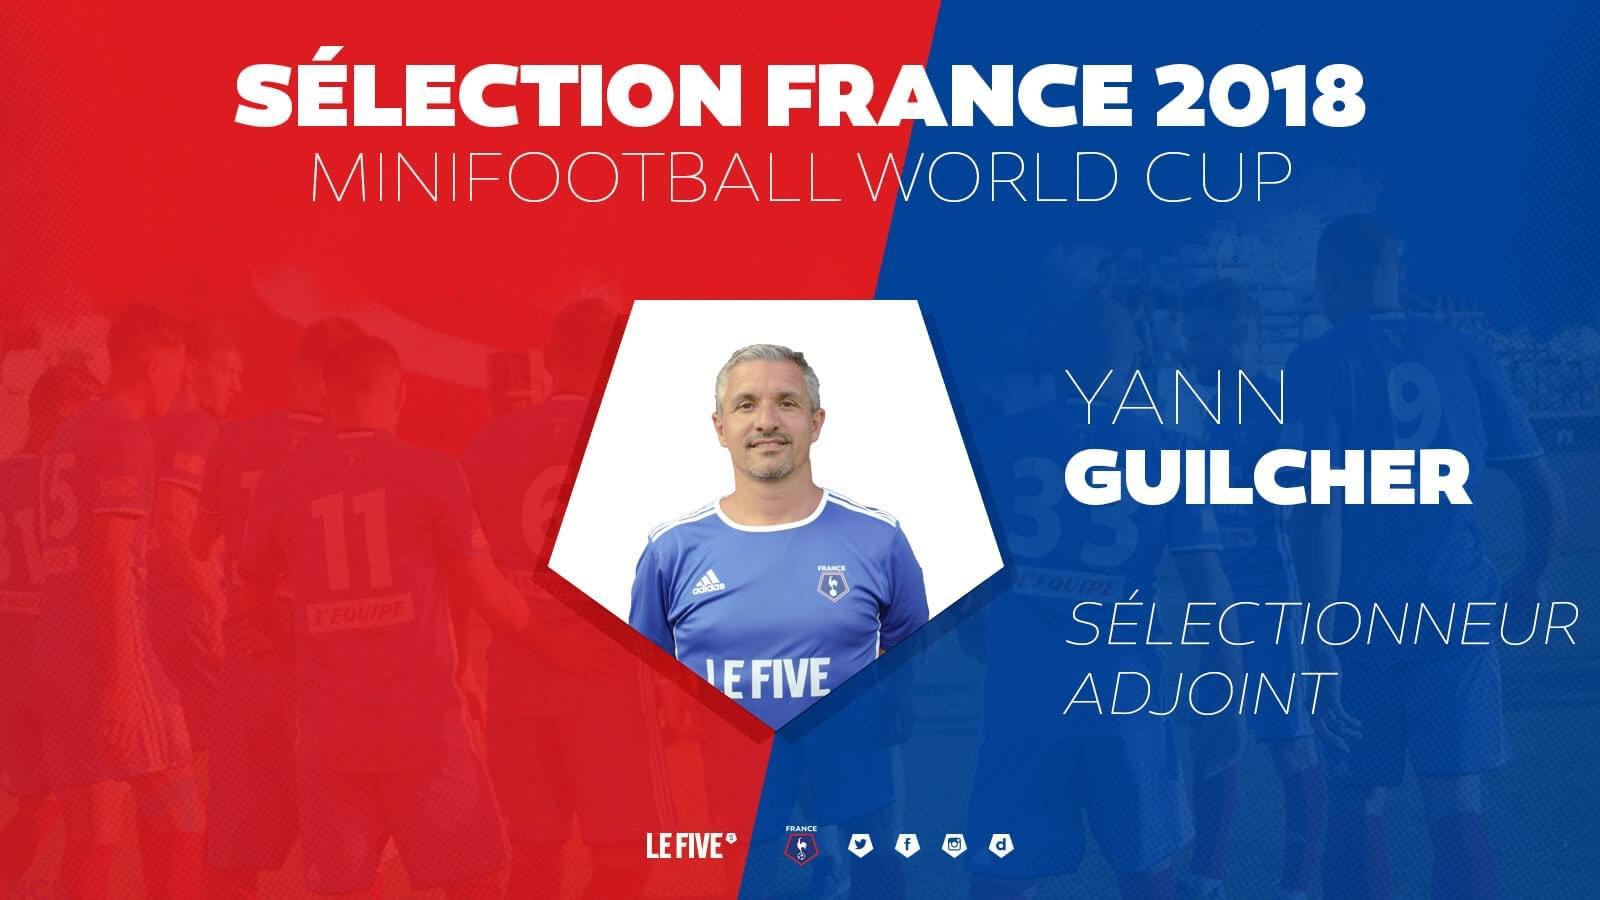 Yann Guilcher